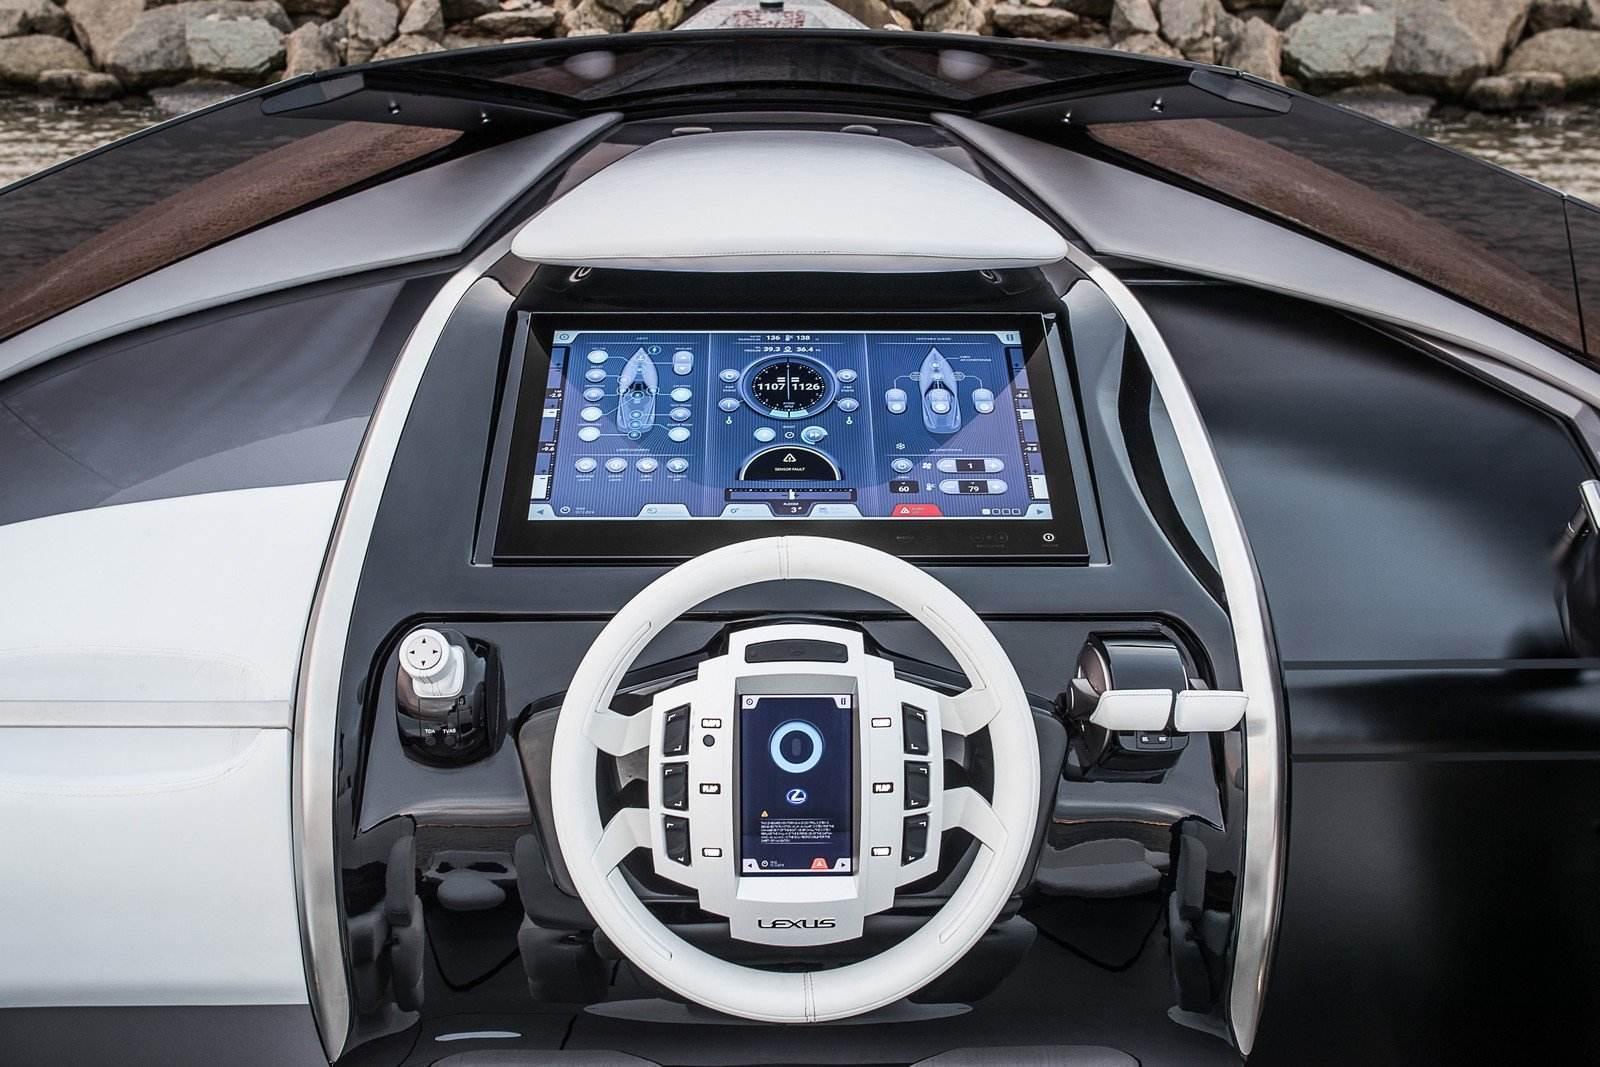 lexus_sport_yacht_concept_12_c0c6bd82a617db6bd3edf8ae3d2d89a2fdb2848b